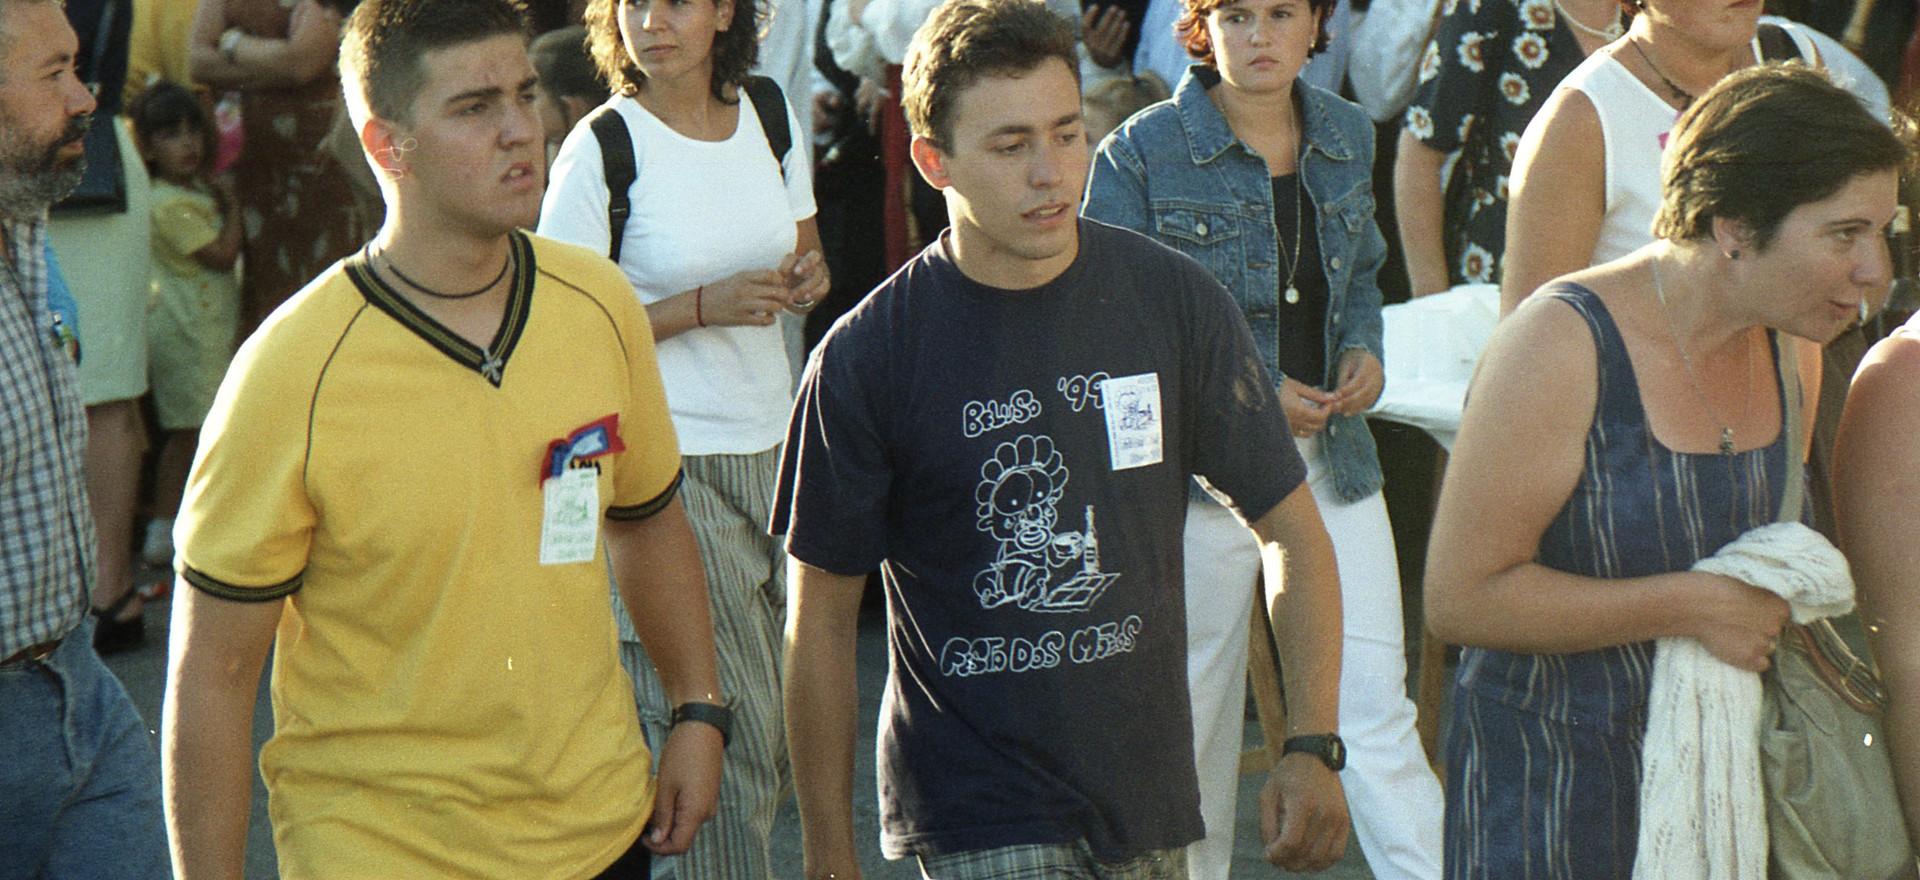 99_09_01_Festa dos Mozos_Beluso_012.jpg